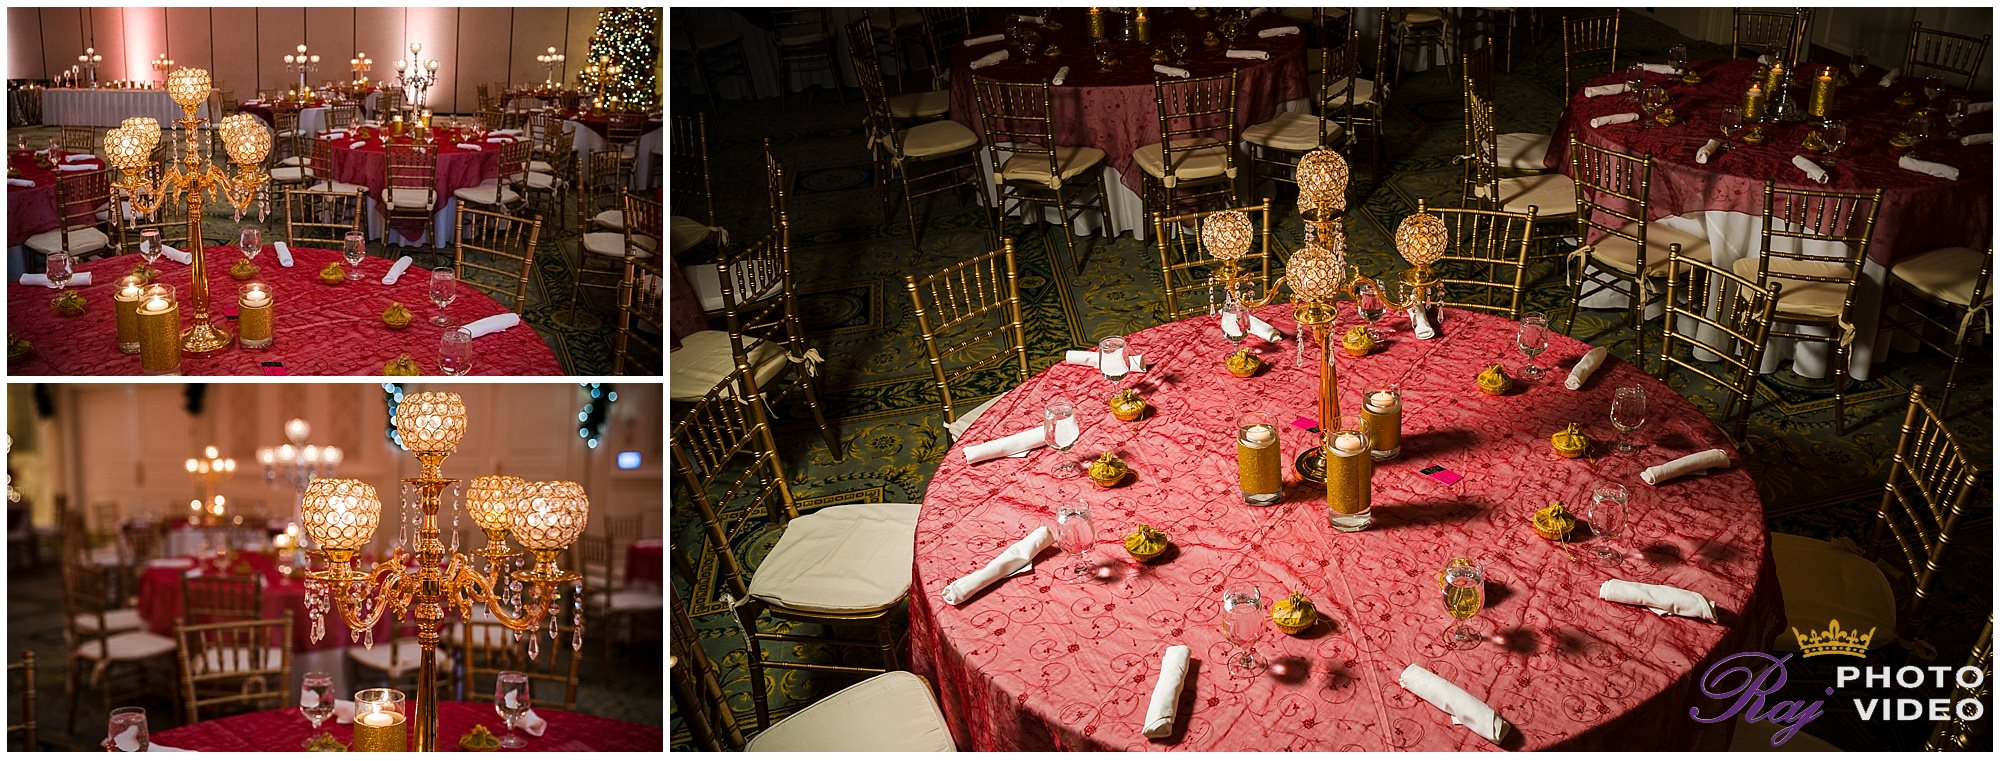 Founders-Inn-and-Spa-Virginia-Beach-VA-Indian-Wedding-Harini-Vivek-74.jpg